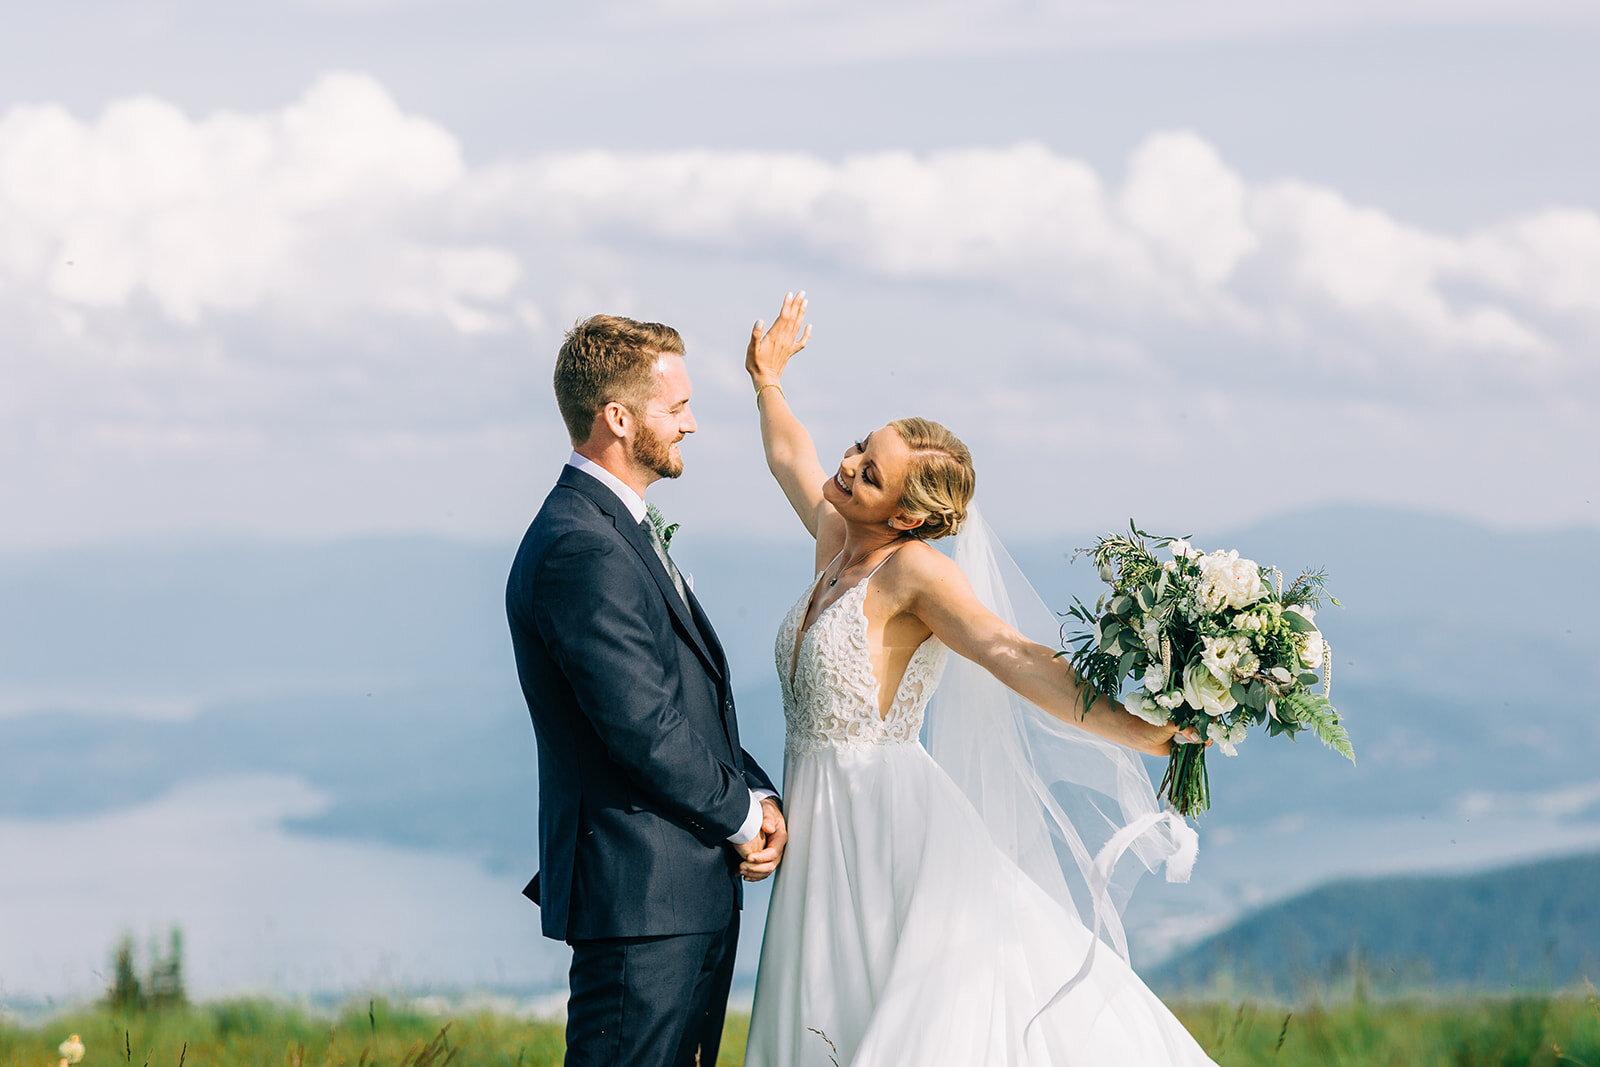 fun bride and groom spokane mountaintop wedding